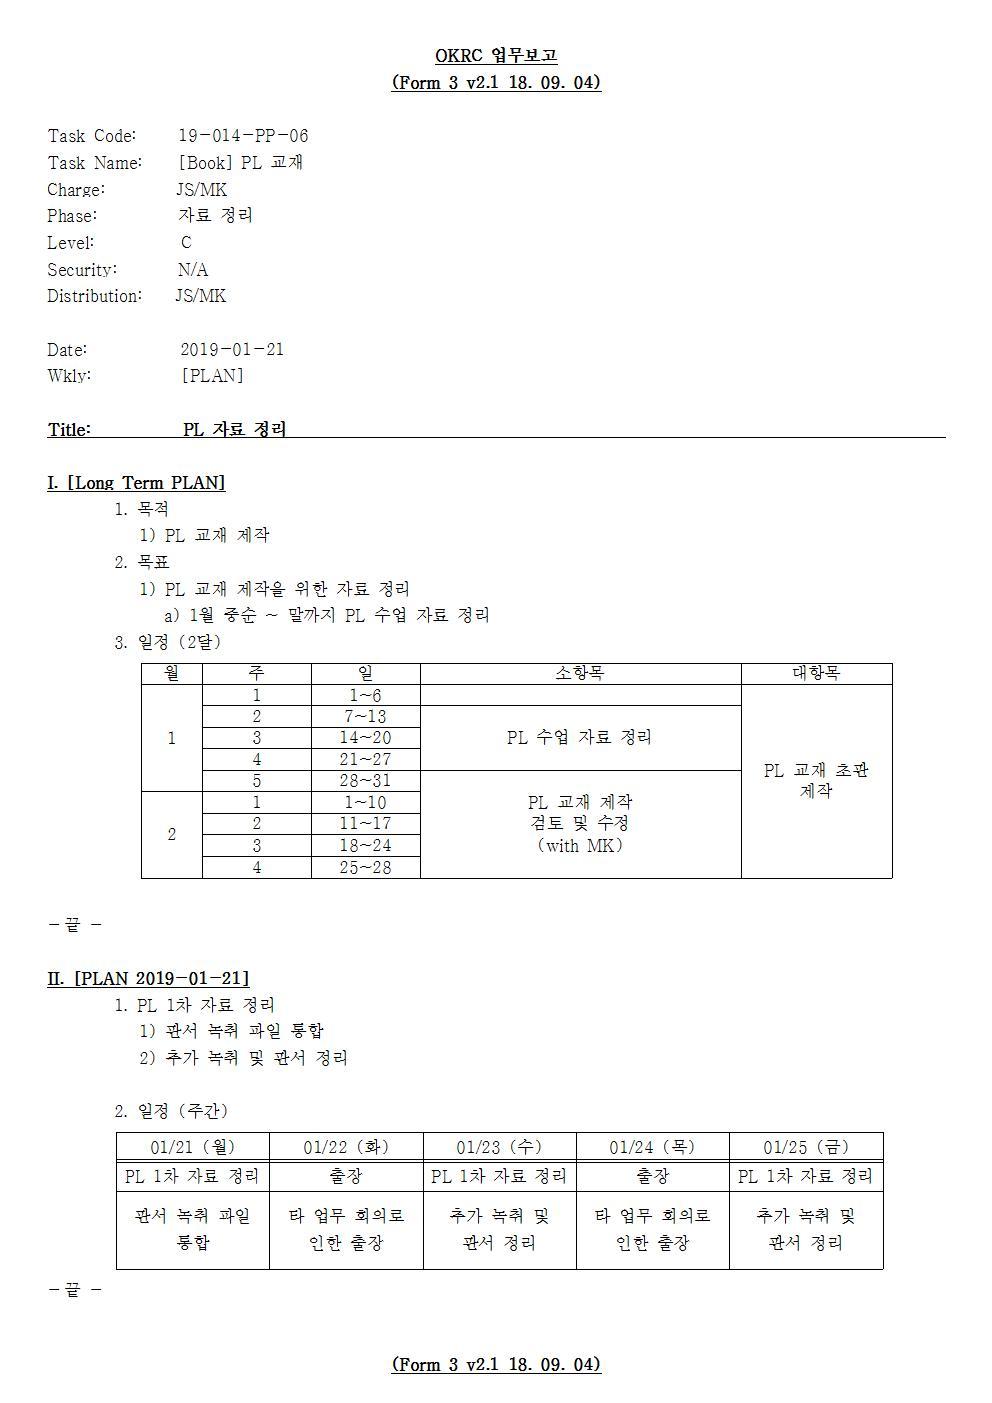 D-[19-014-PP-06]-[Book-PL]-[2019-01-21][JS]001.jpg